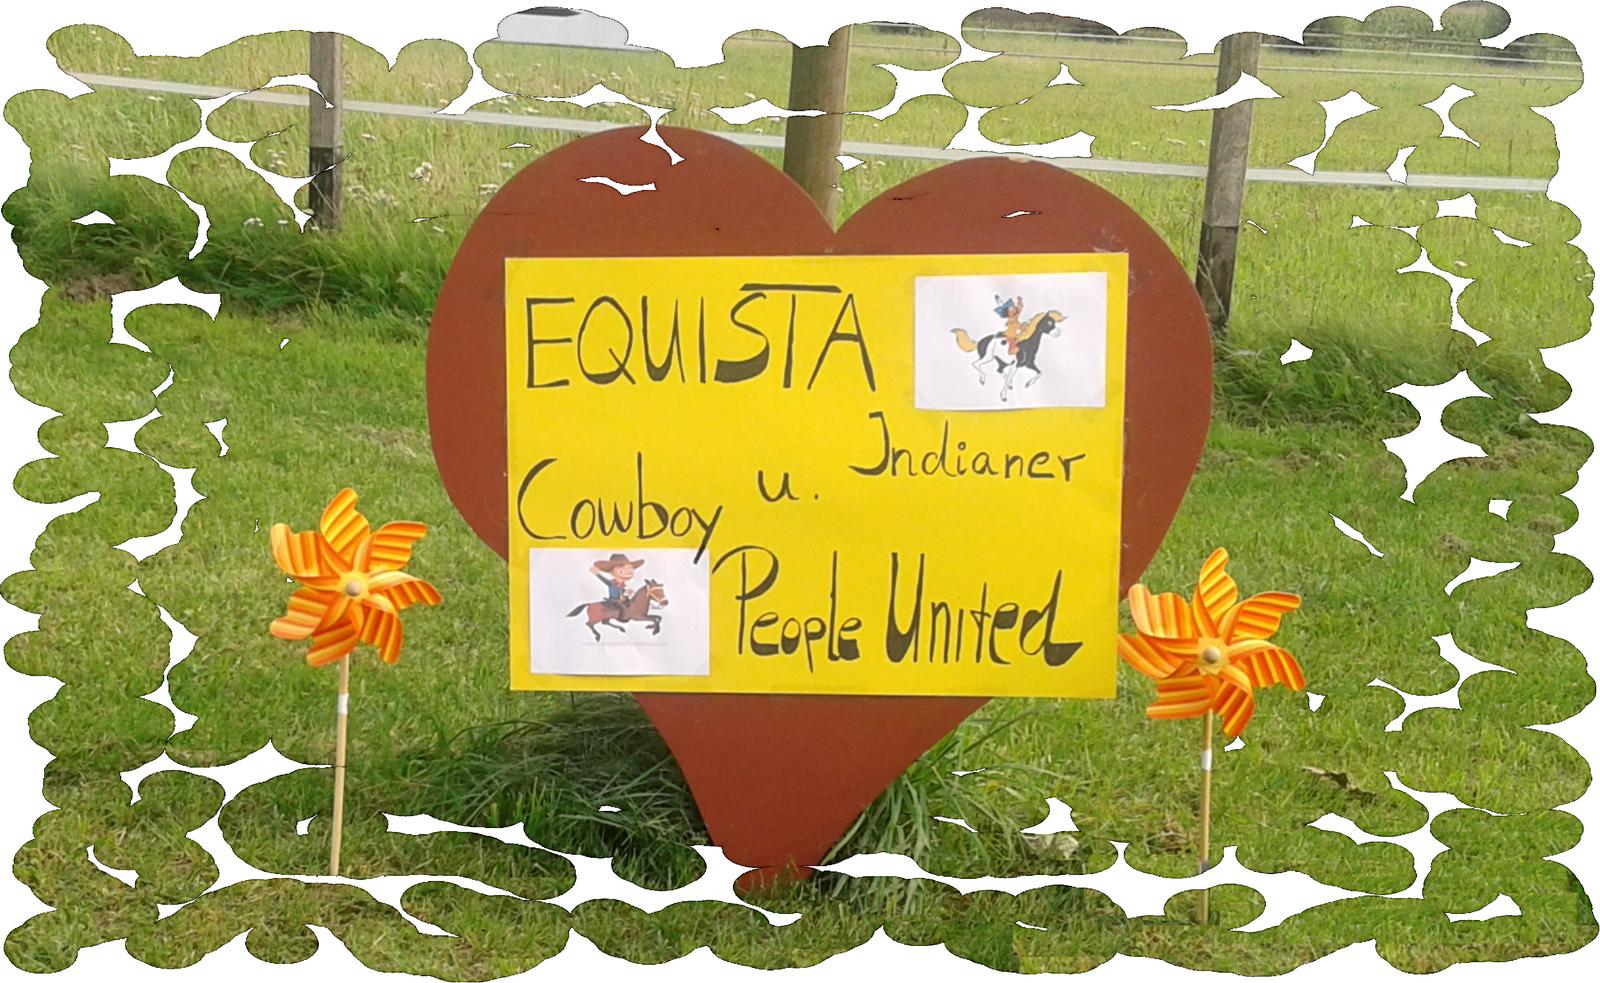 1-Equista Eingangsbild bearbeitet-cowbuindi-2017